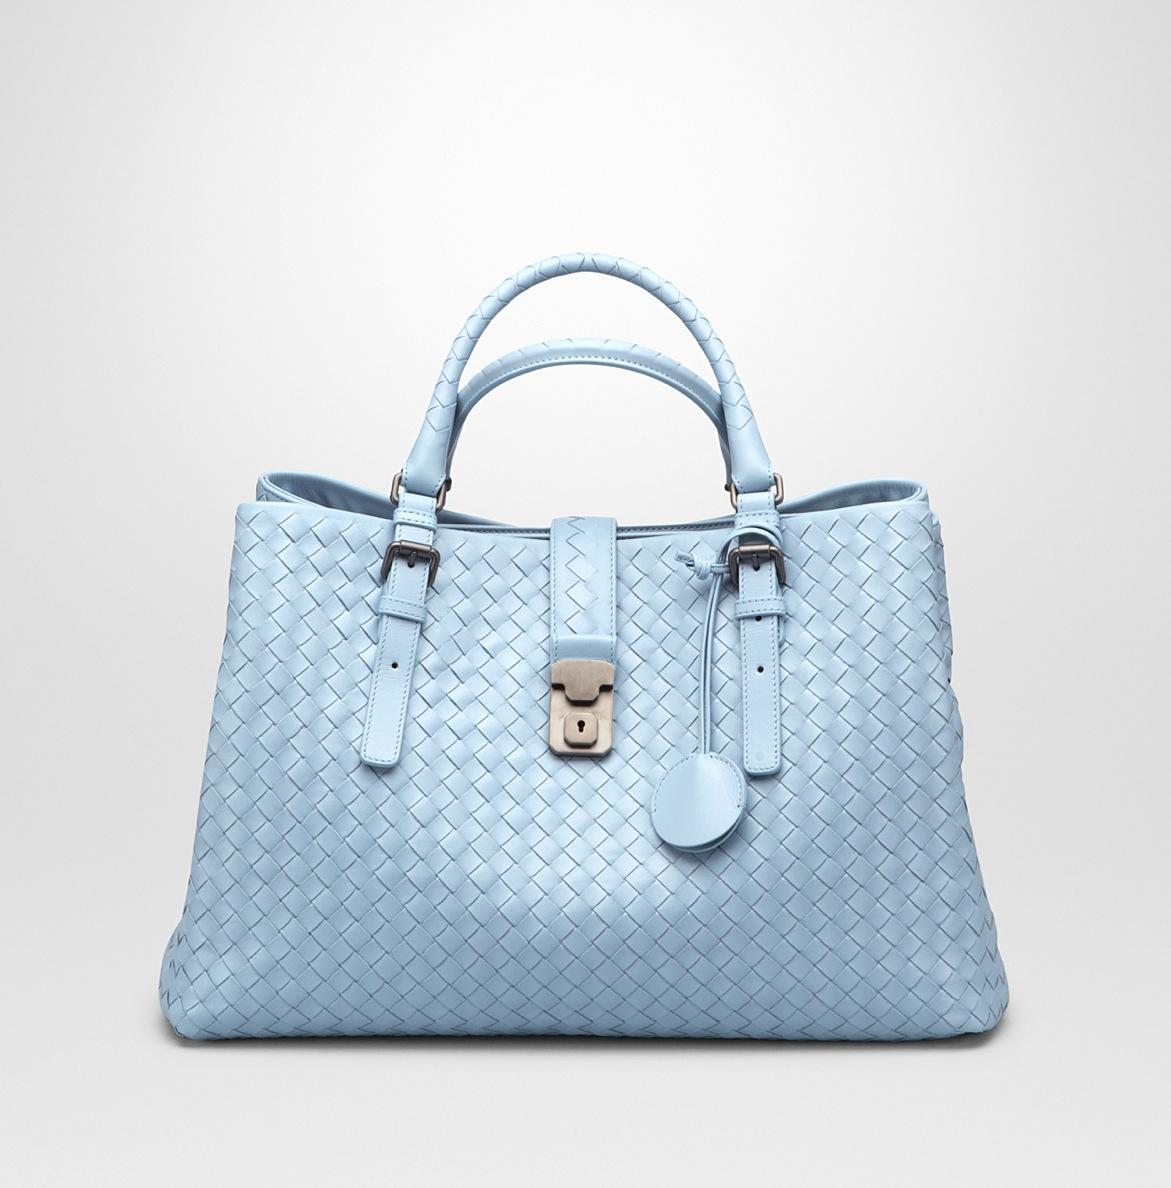 b9bdda748b61 bottega veneta bags price india